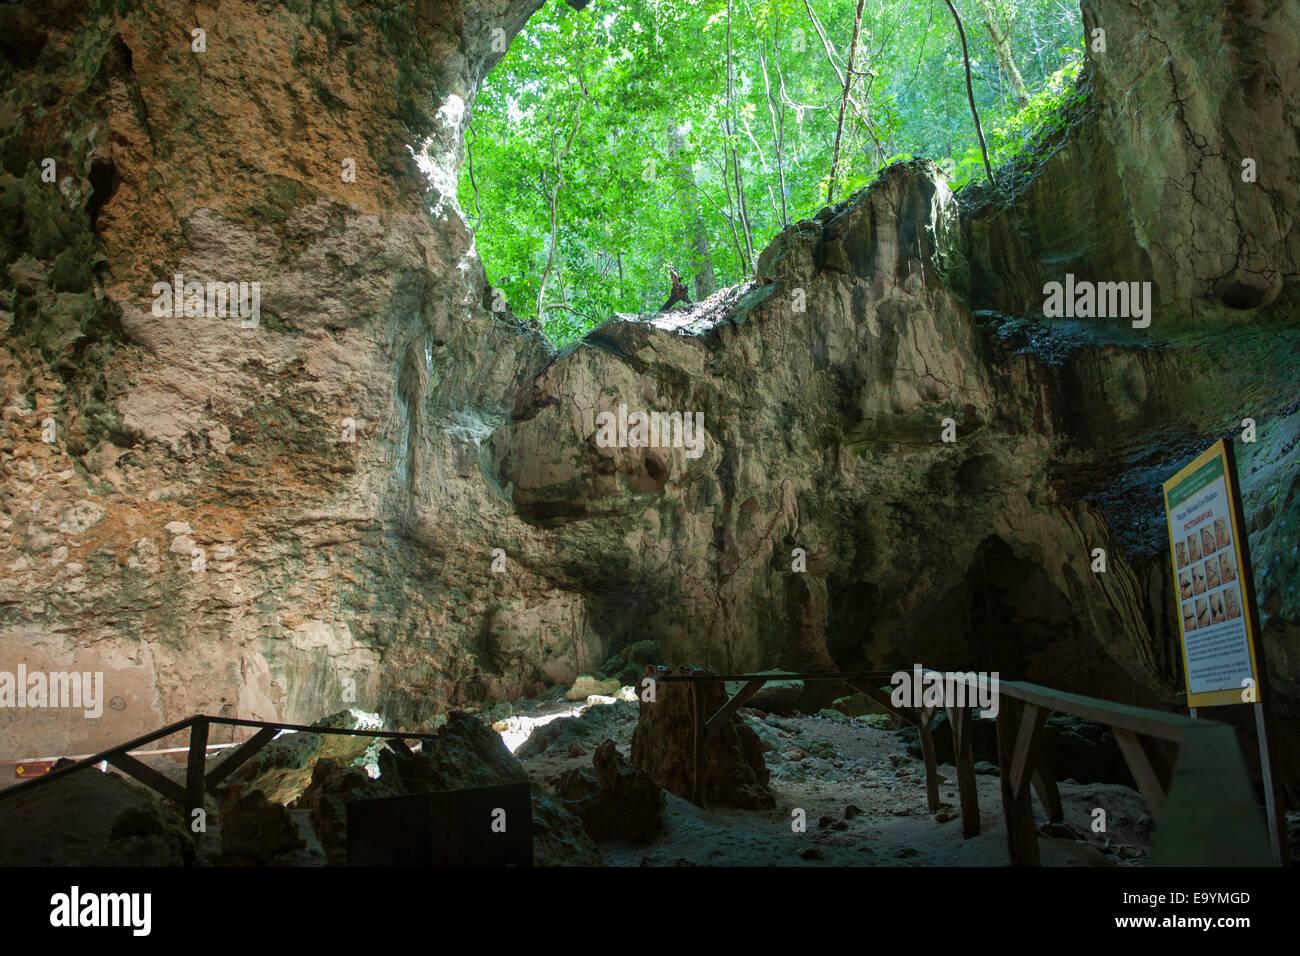 Dominikanische Republik, Osten, Sabana de la Mar, Nationalpark Los Haitises, Cueva de la Linea - Stock Image